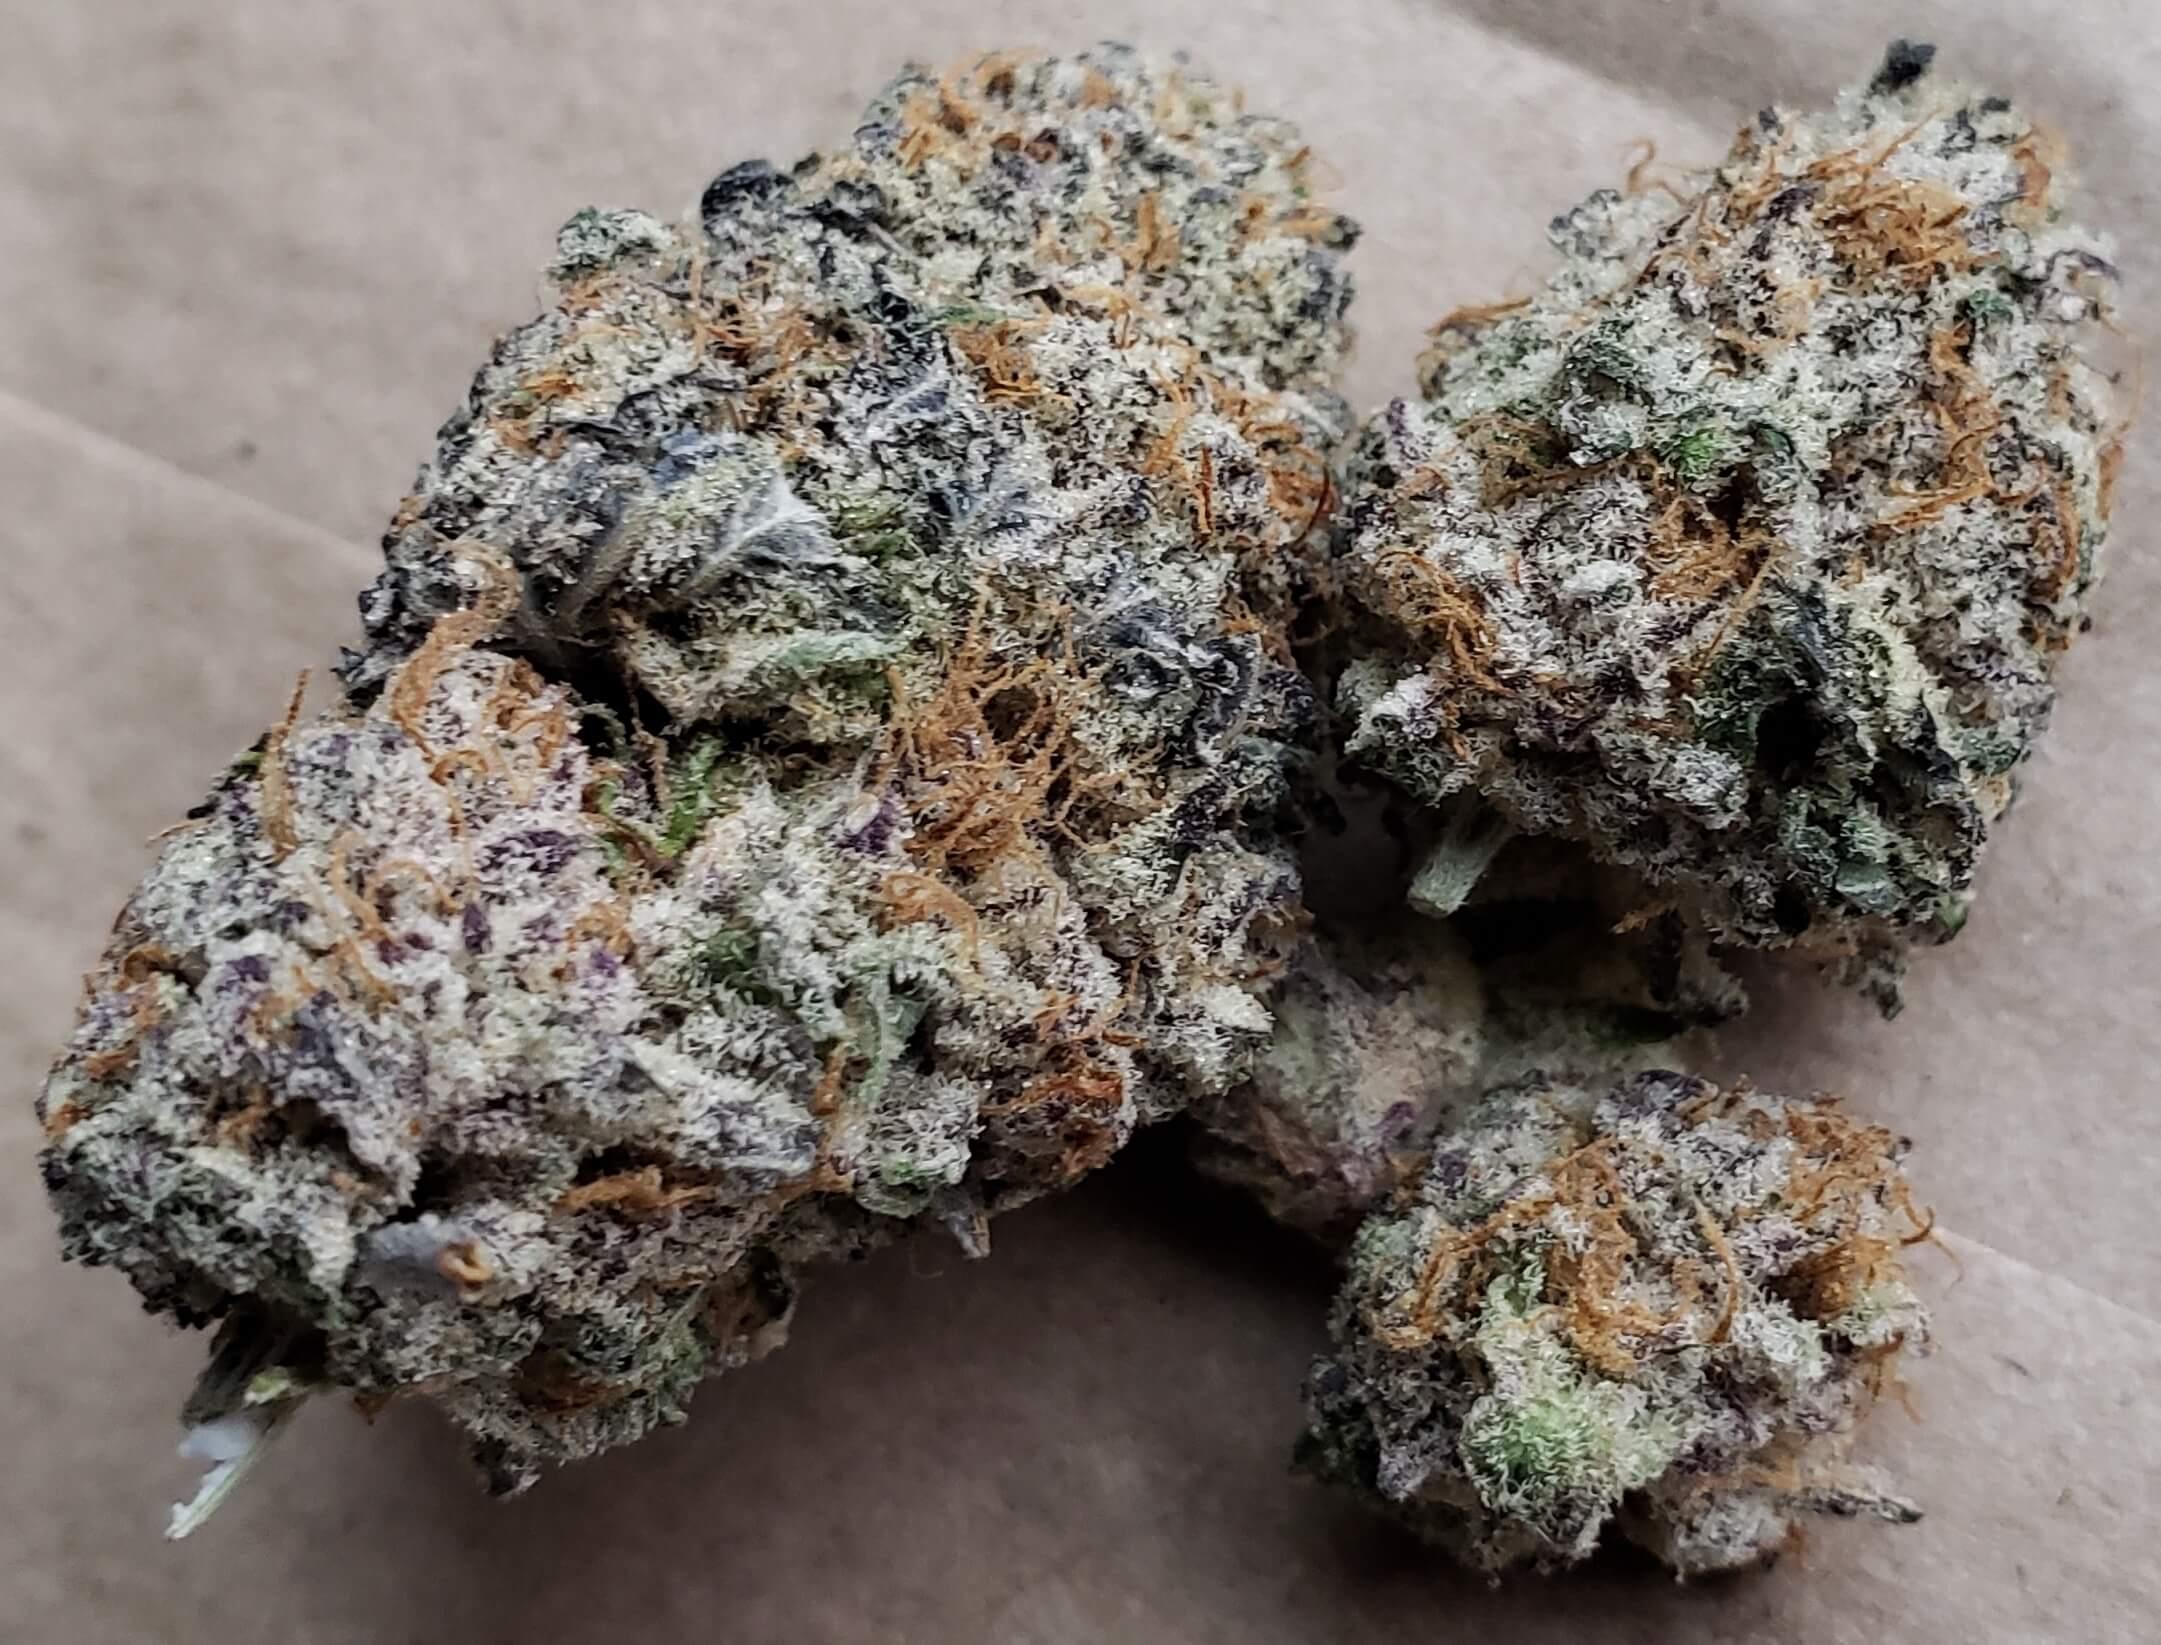 Bagged Buds DC Sucker Punch marijuana flowers